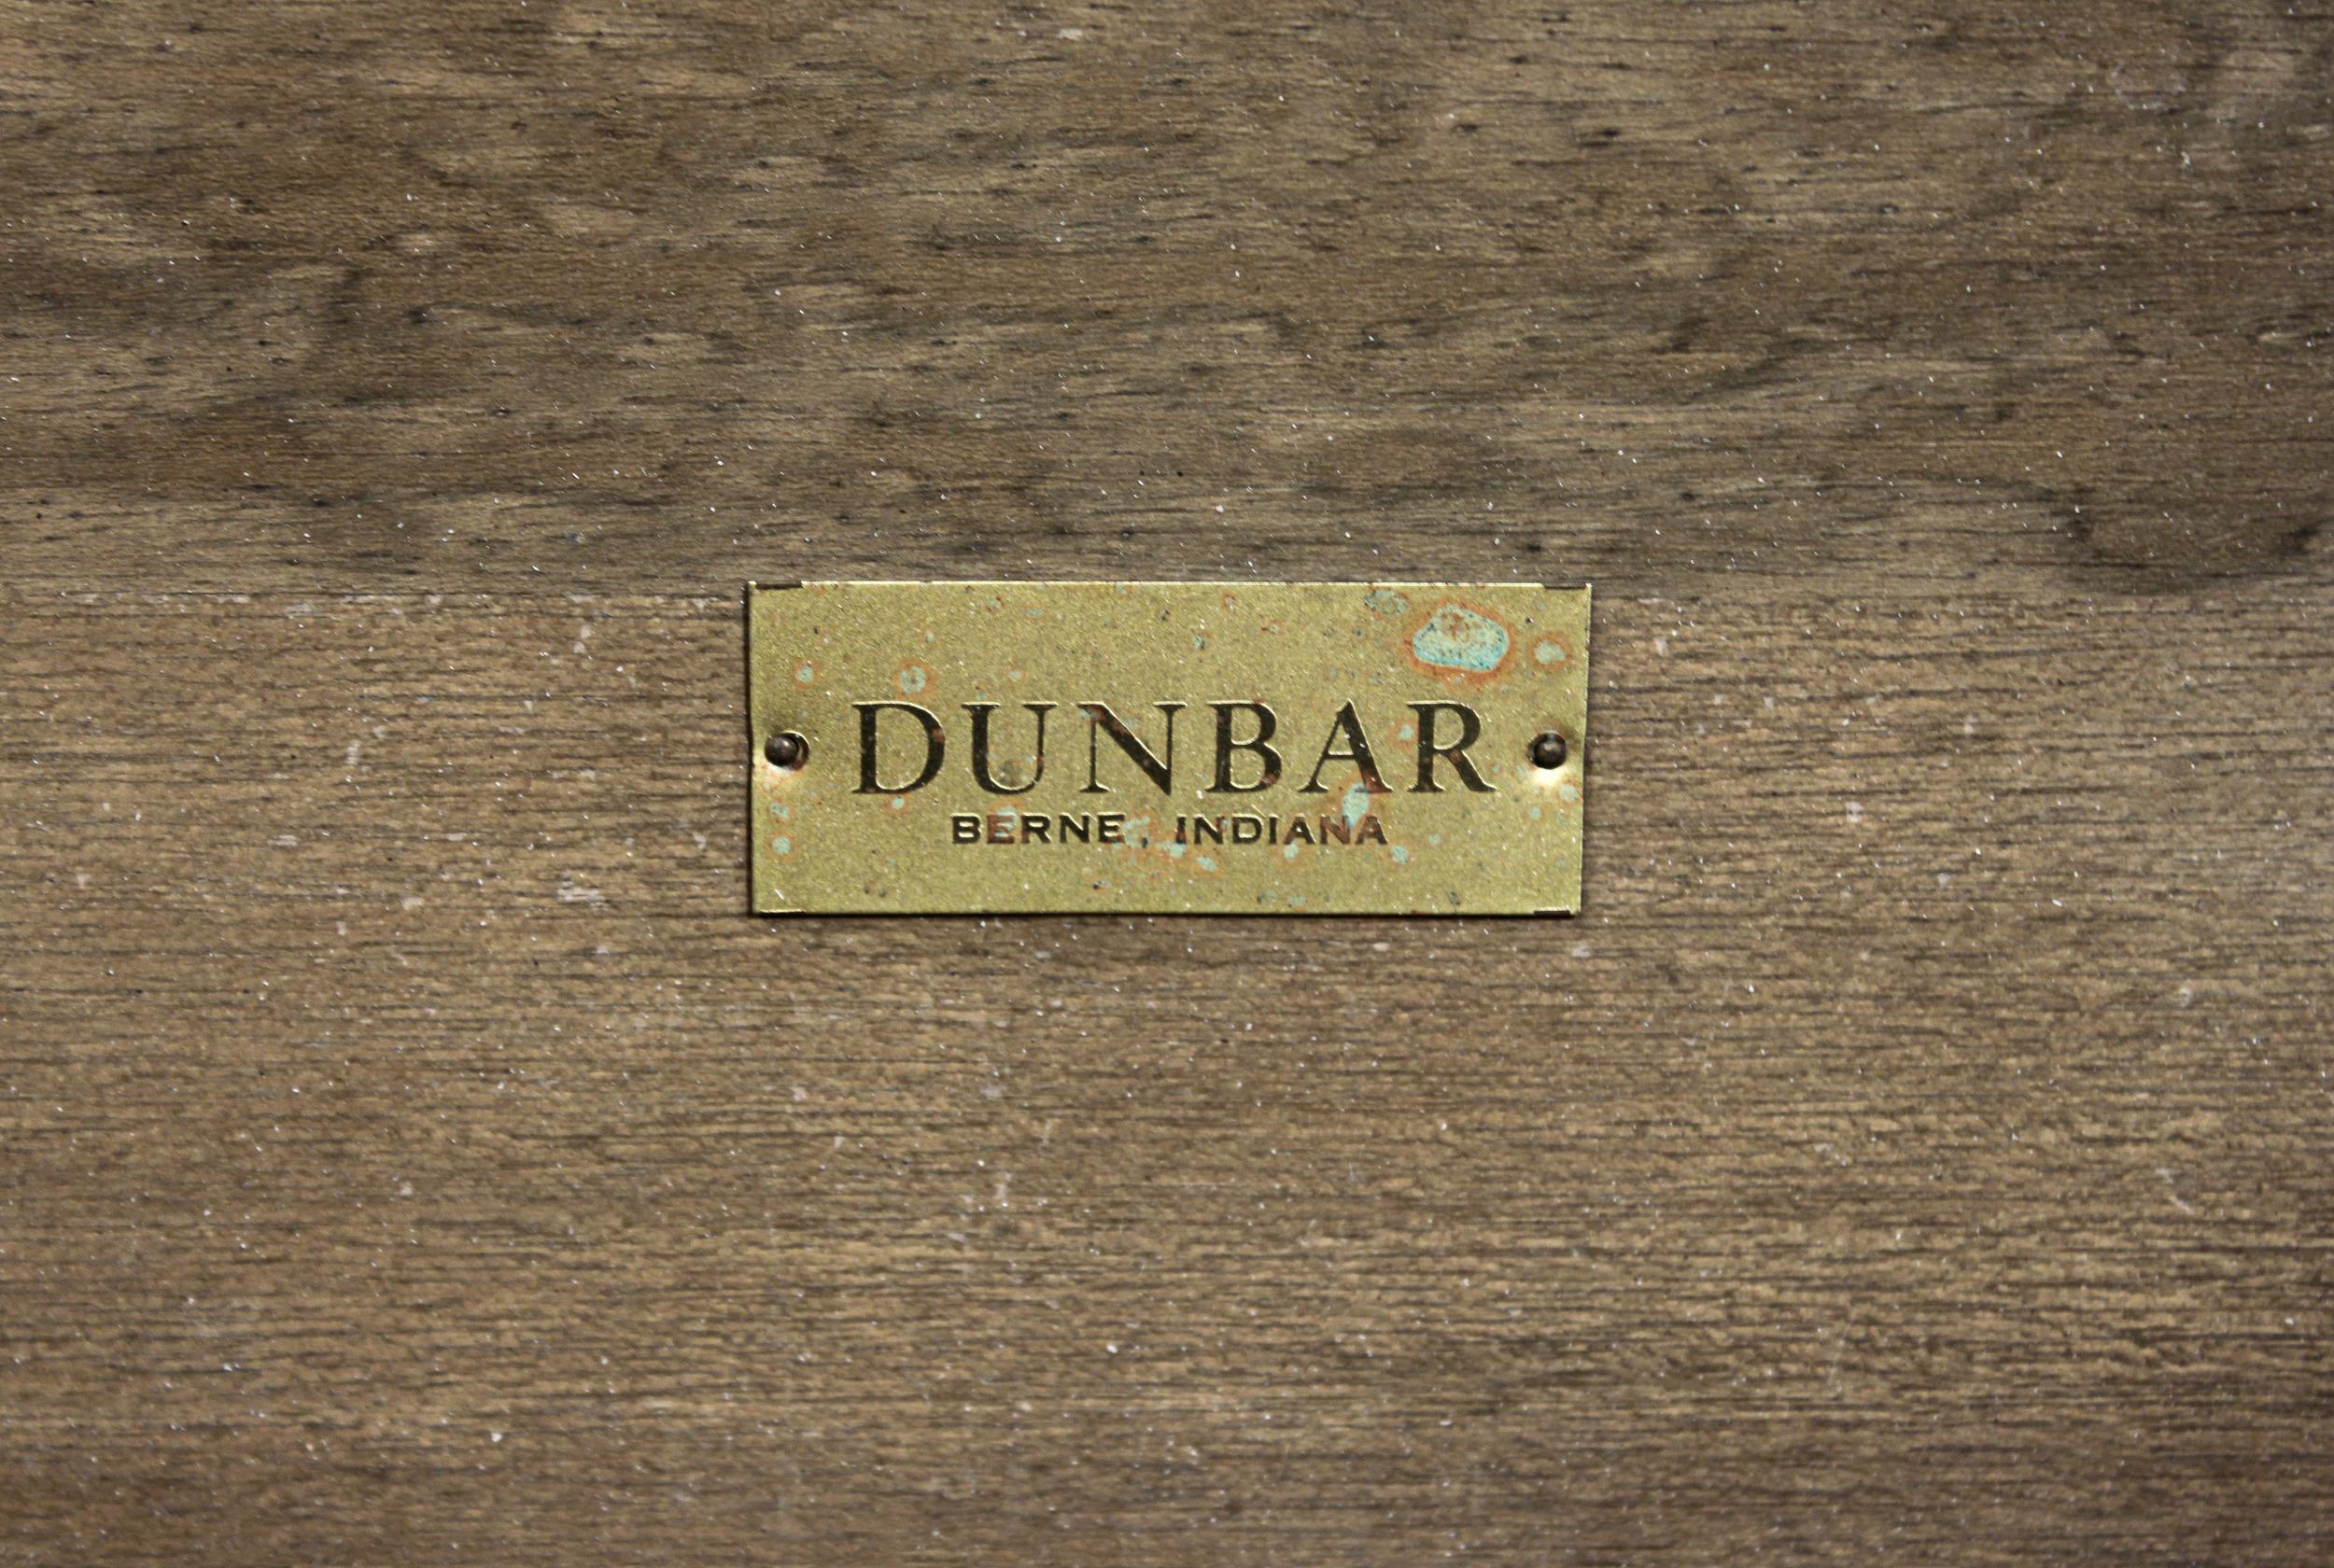 Dunbar 35 teak rectangular endtable44 detail.jpg